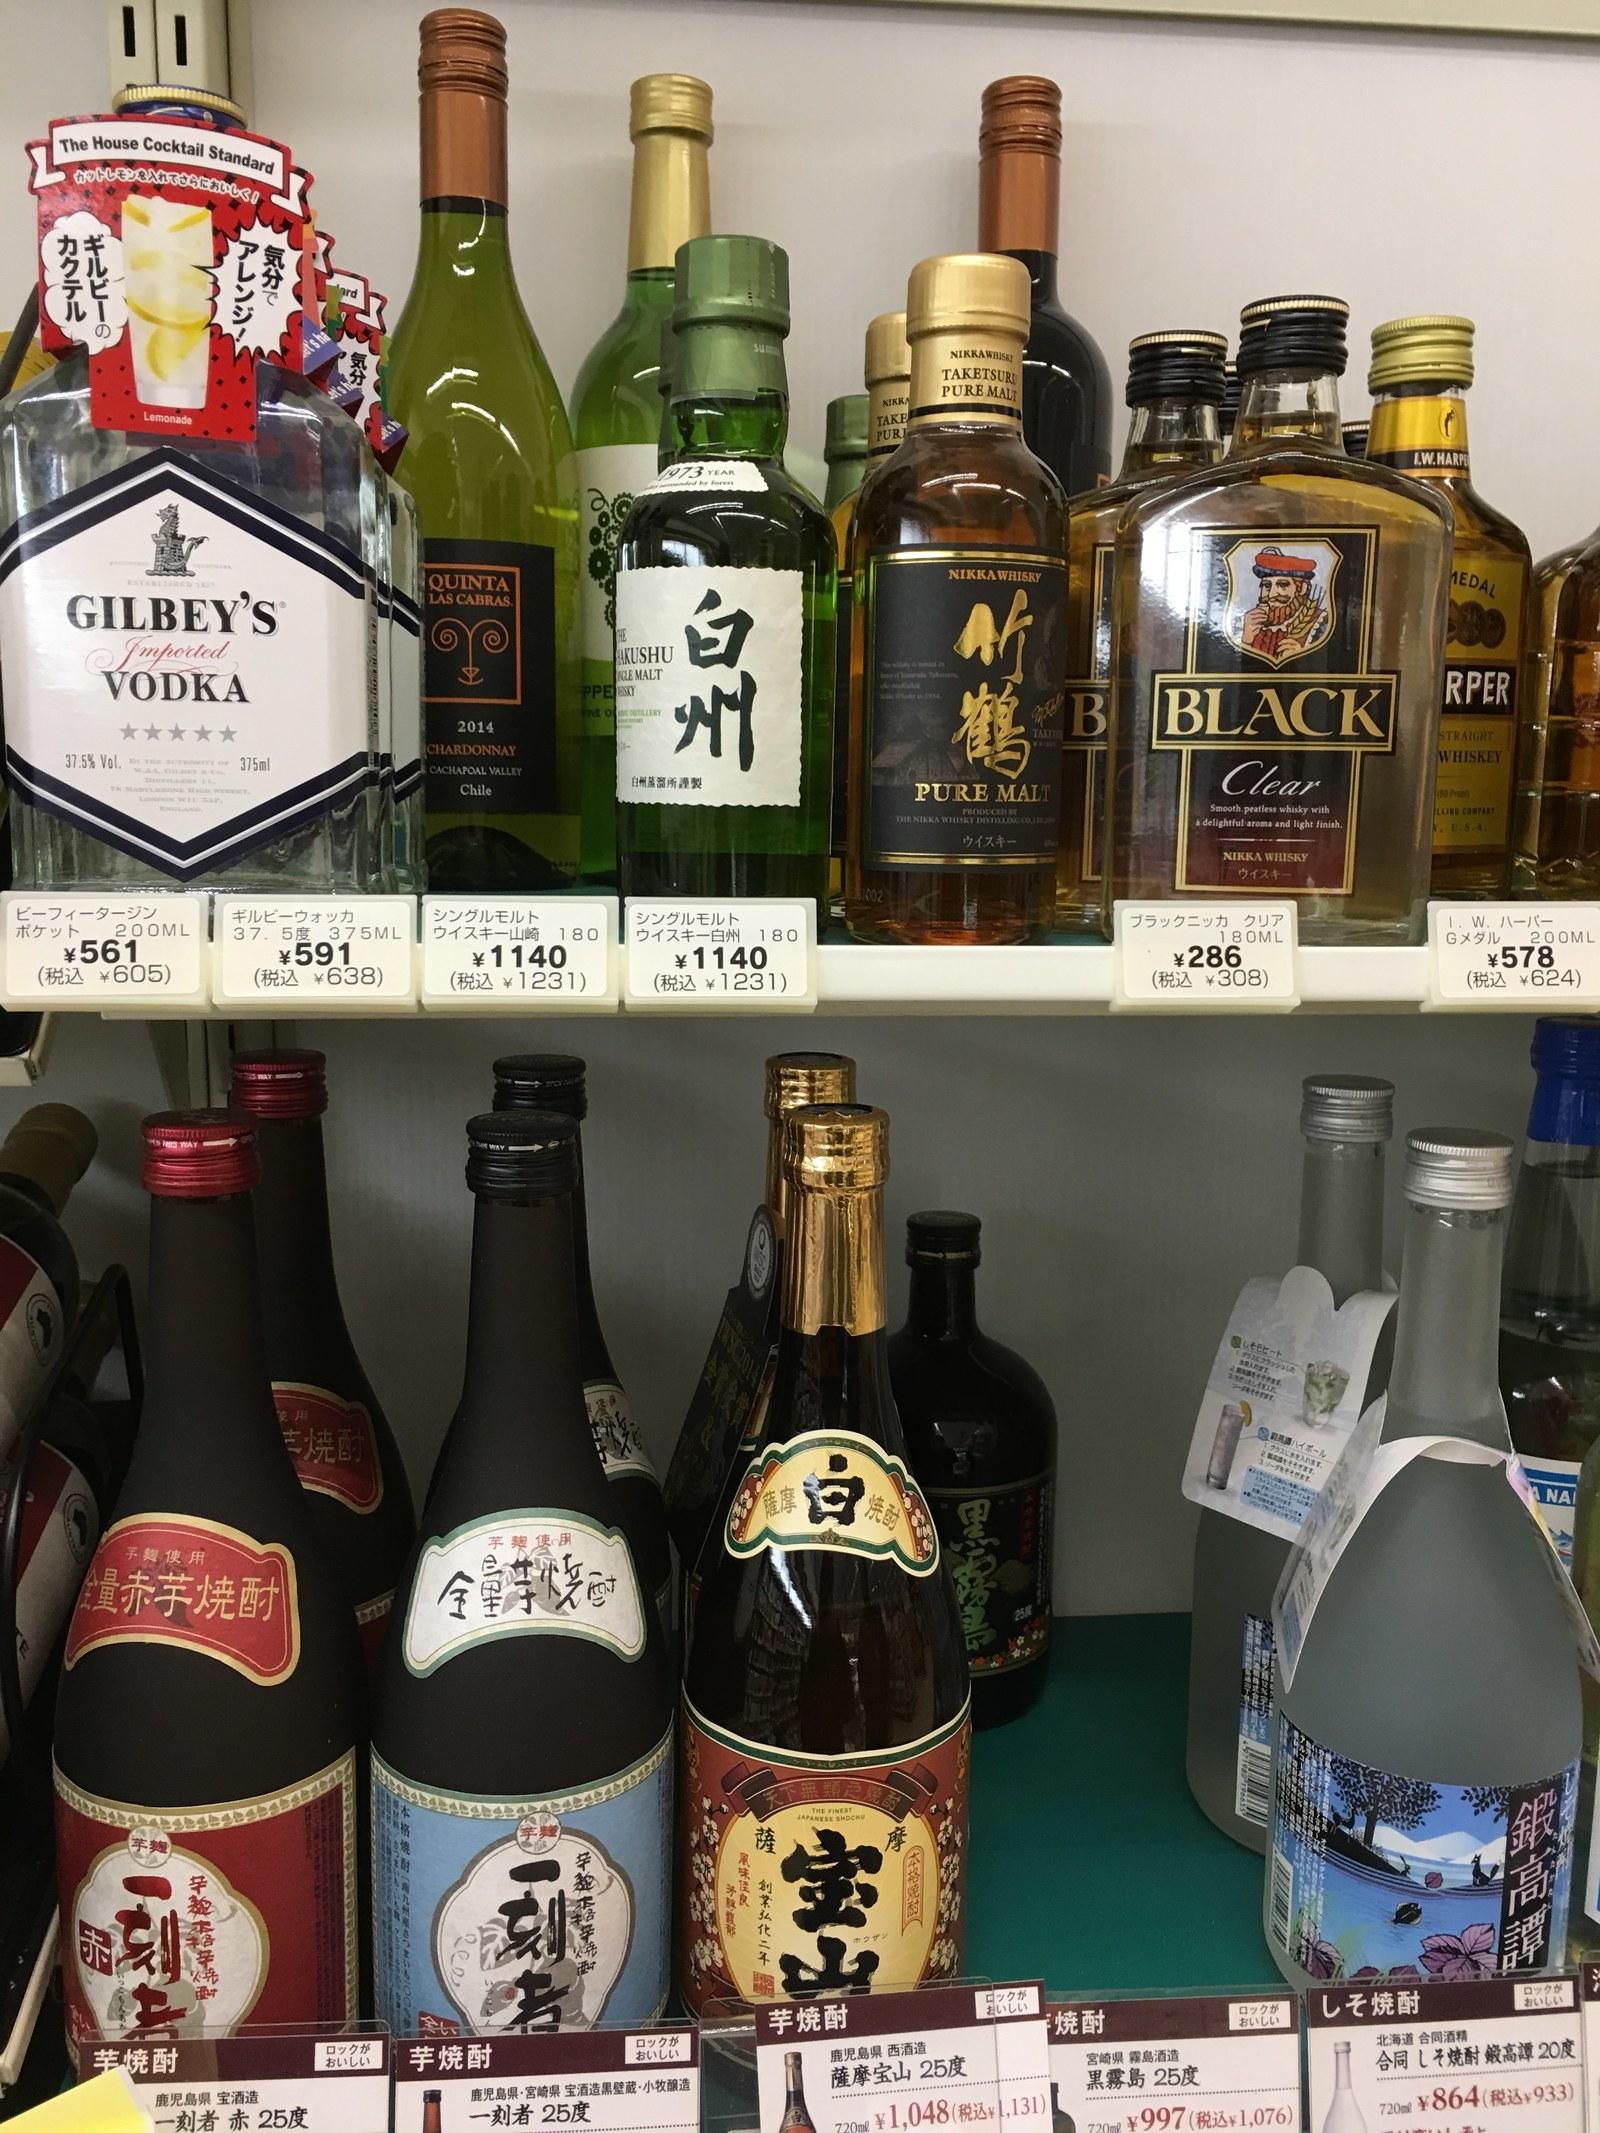 a selection of liquor bottles